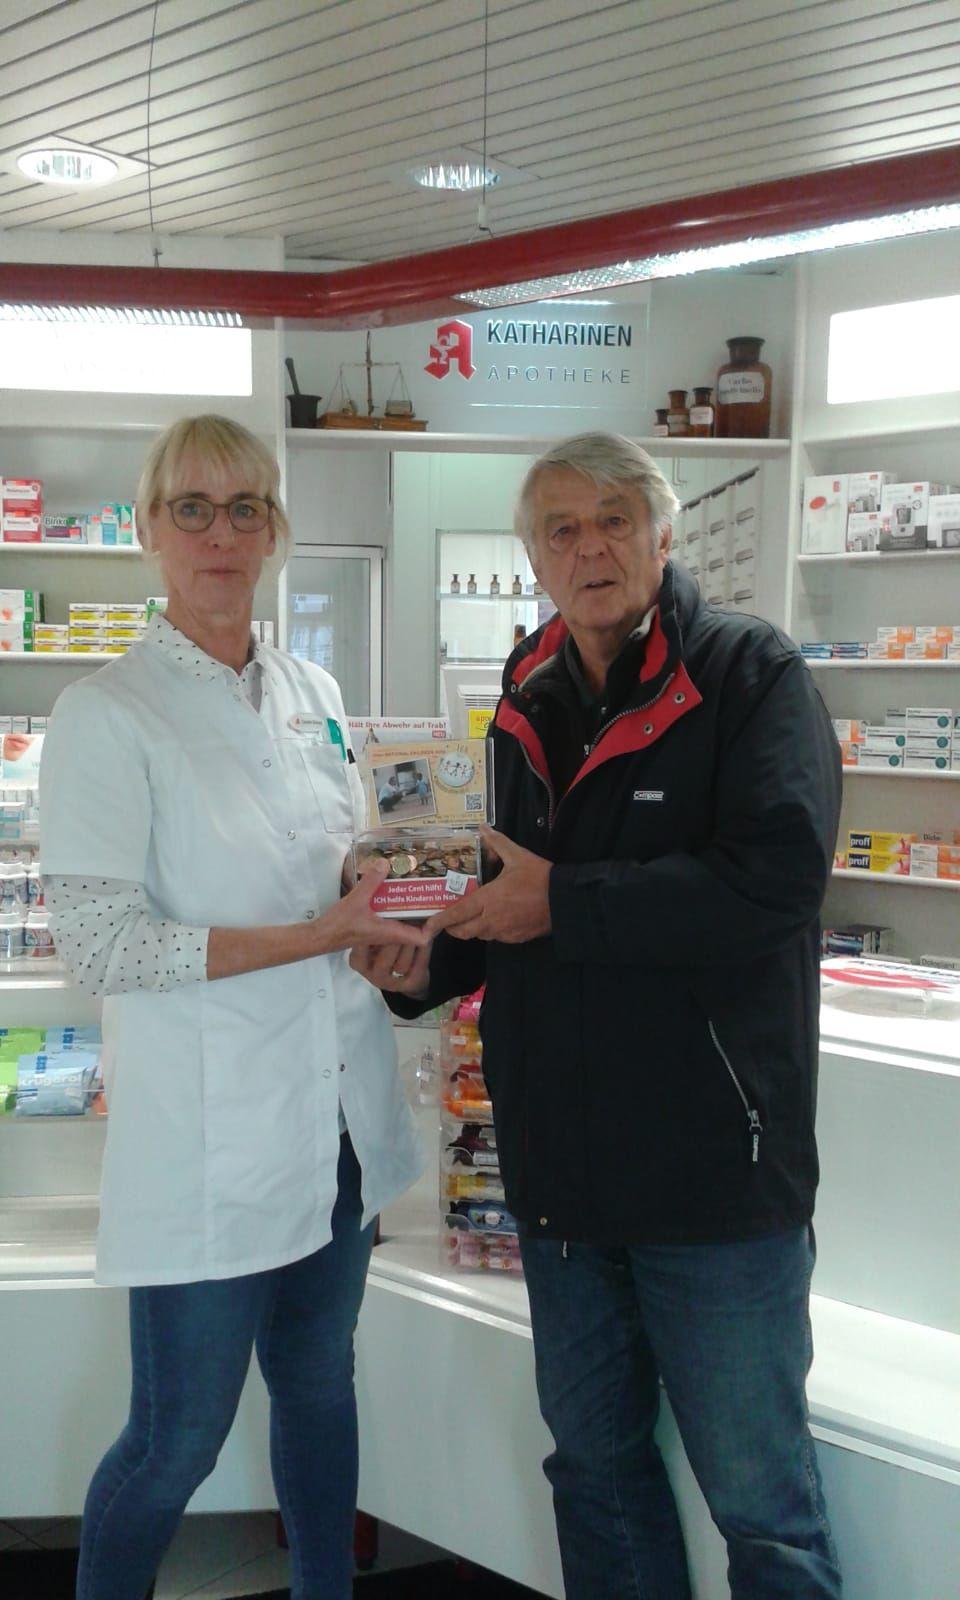 Kinderhilfswerksförderer in Neubrandenburg aktiv